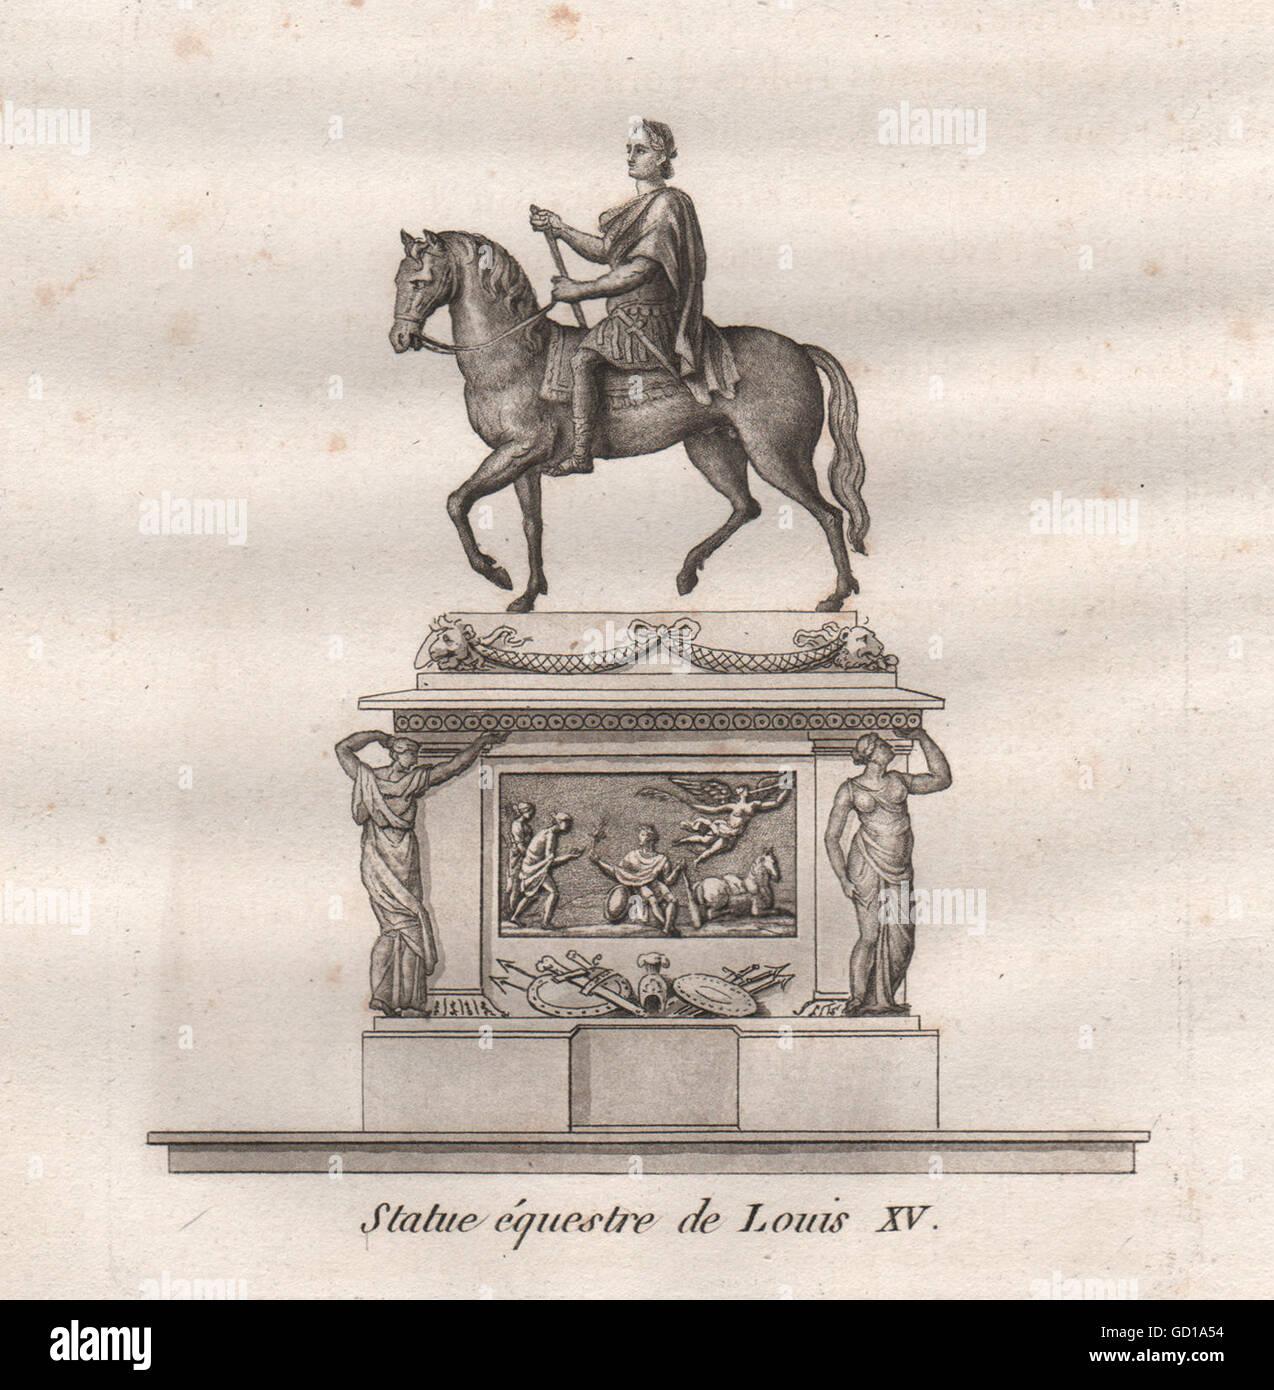 PARIS: Statue équestre de Louis XV. Aquatint, antique print 1808 - Stock Image